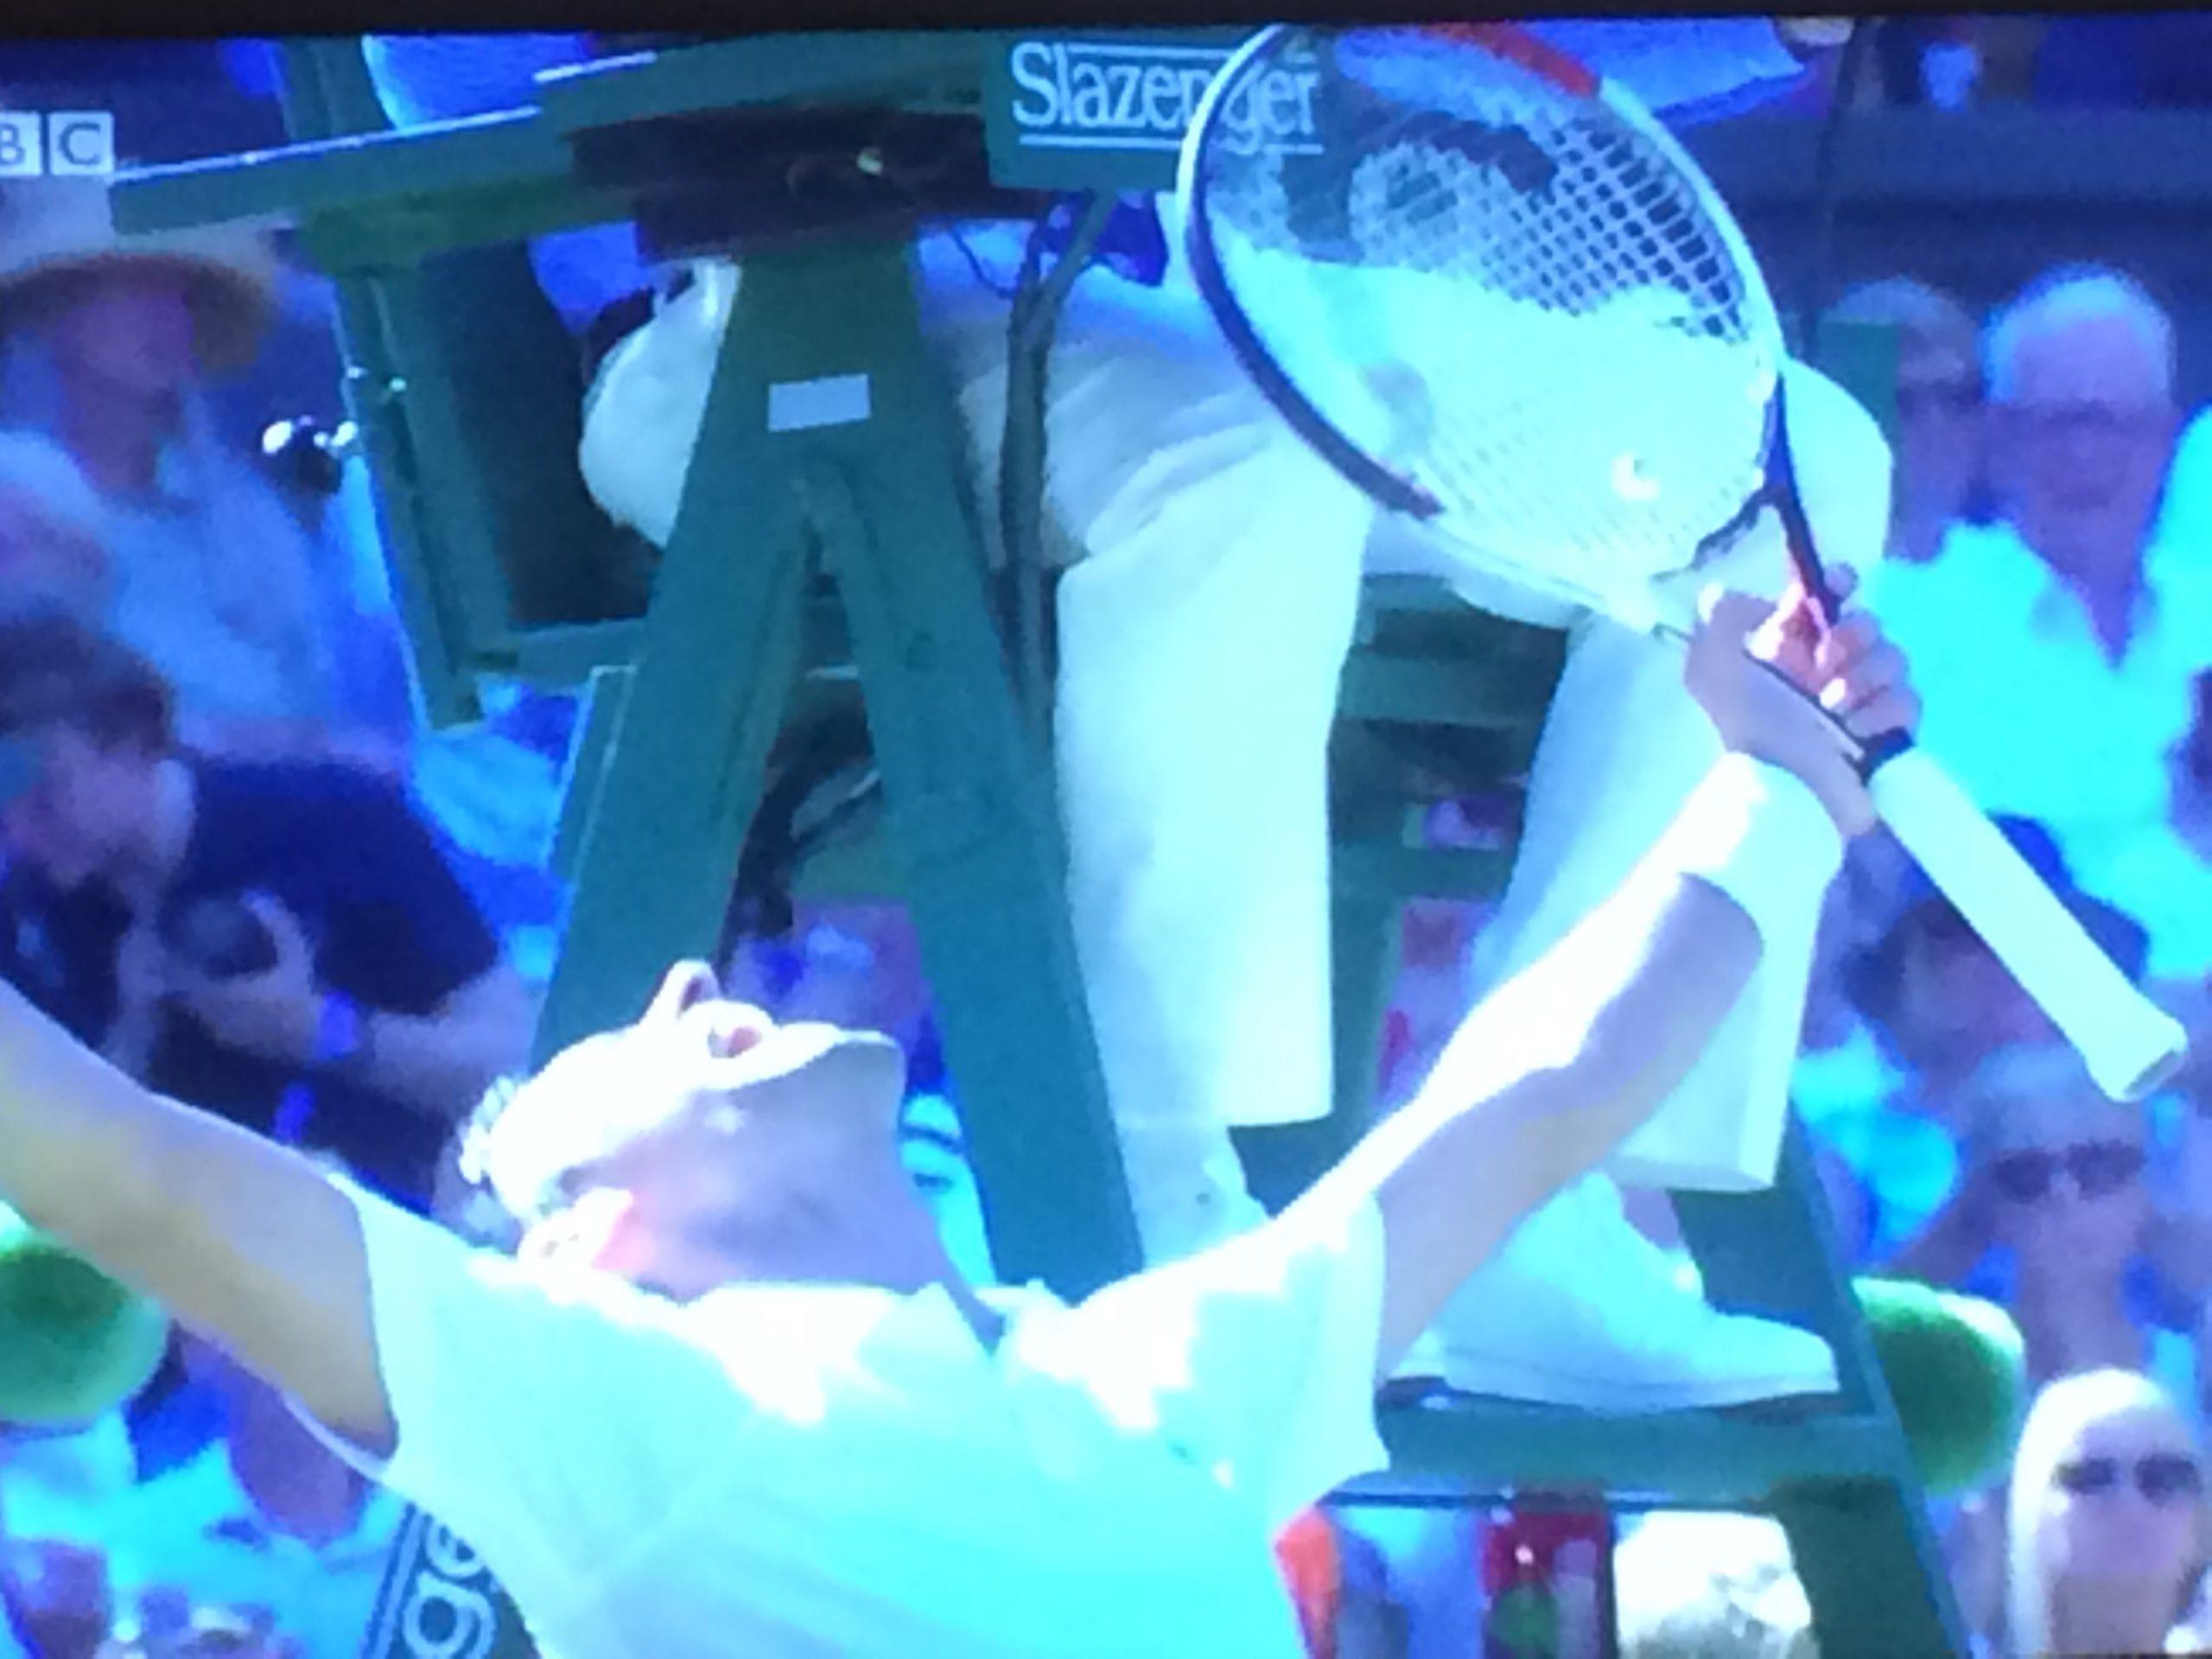 Djokovic winning the men's singles at Wimbledon 2018